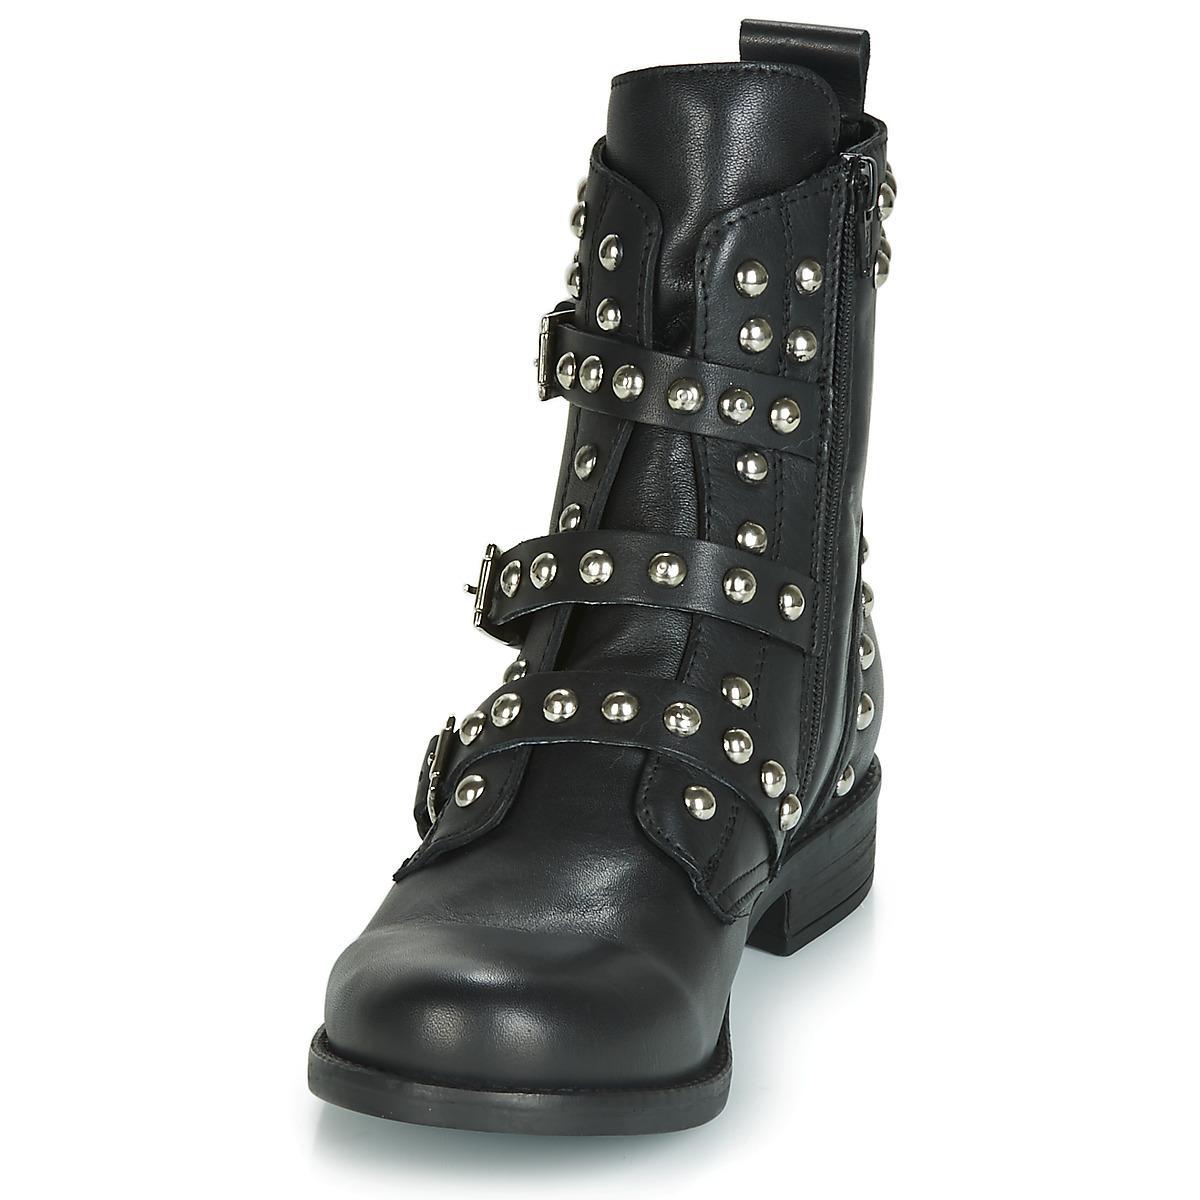 30ca085fad9 Steve Madden - Black Spunky Low Ankle Boots - Lyst. View fullscreen